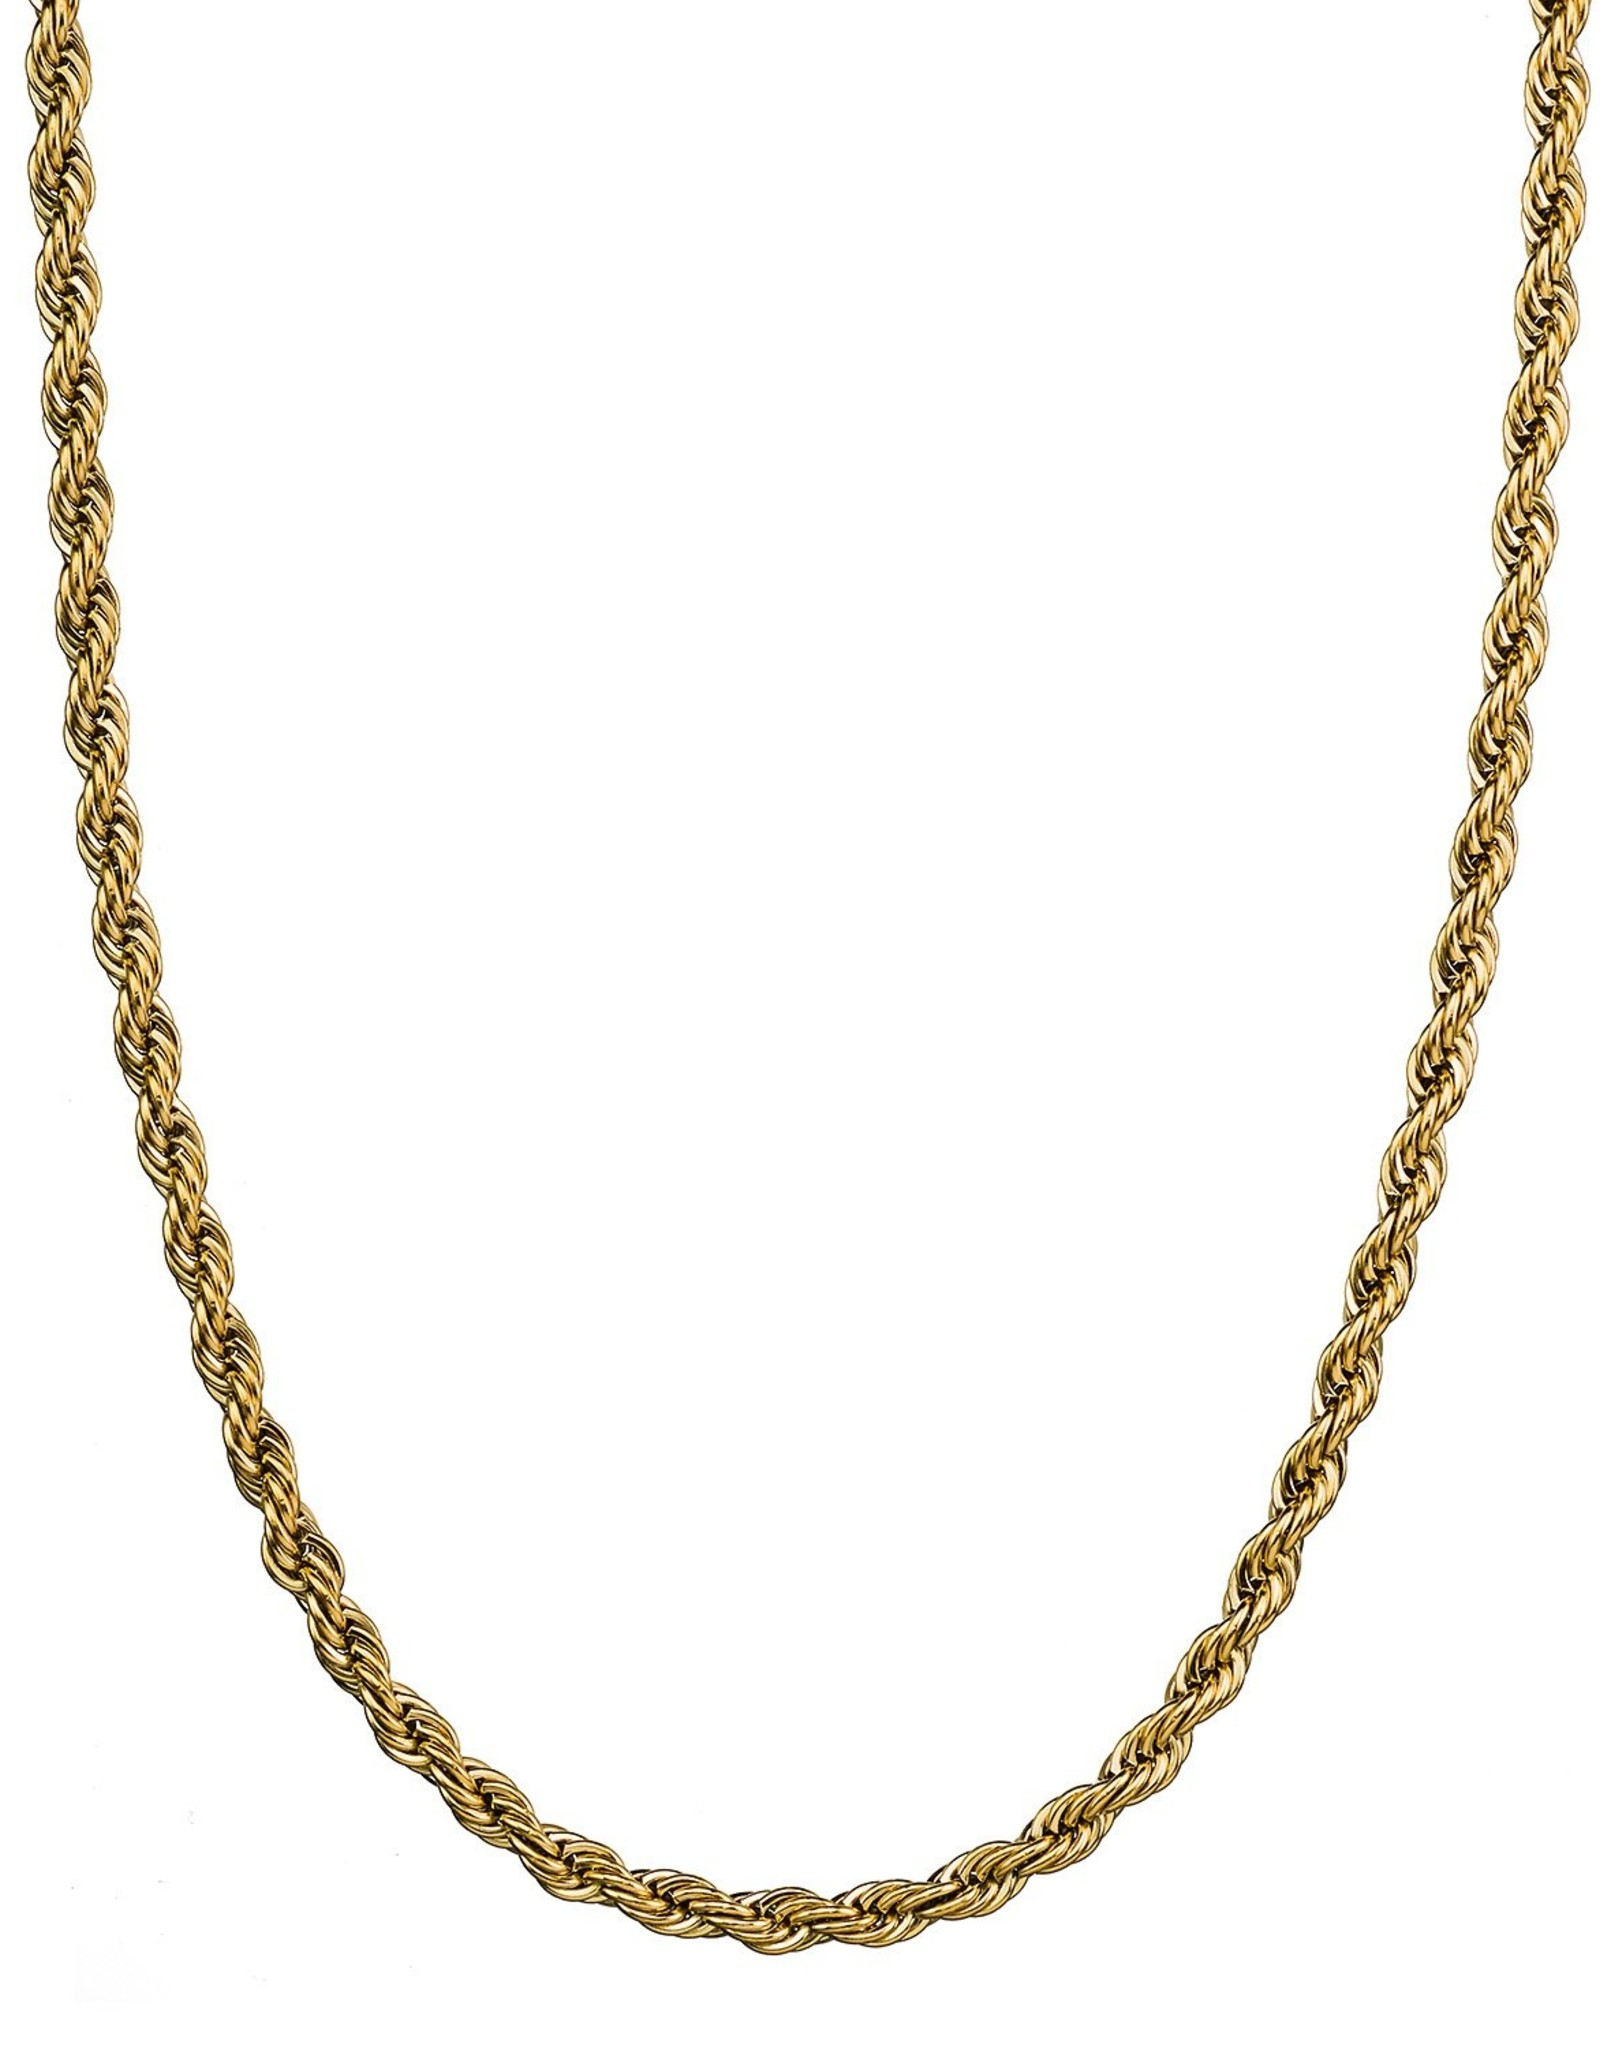 Croyez Chain rope 5mm 14k gold 55cm